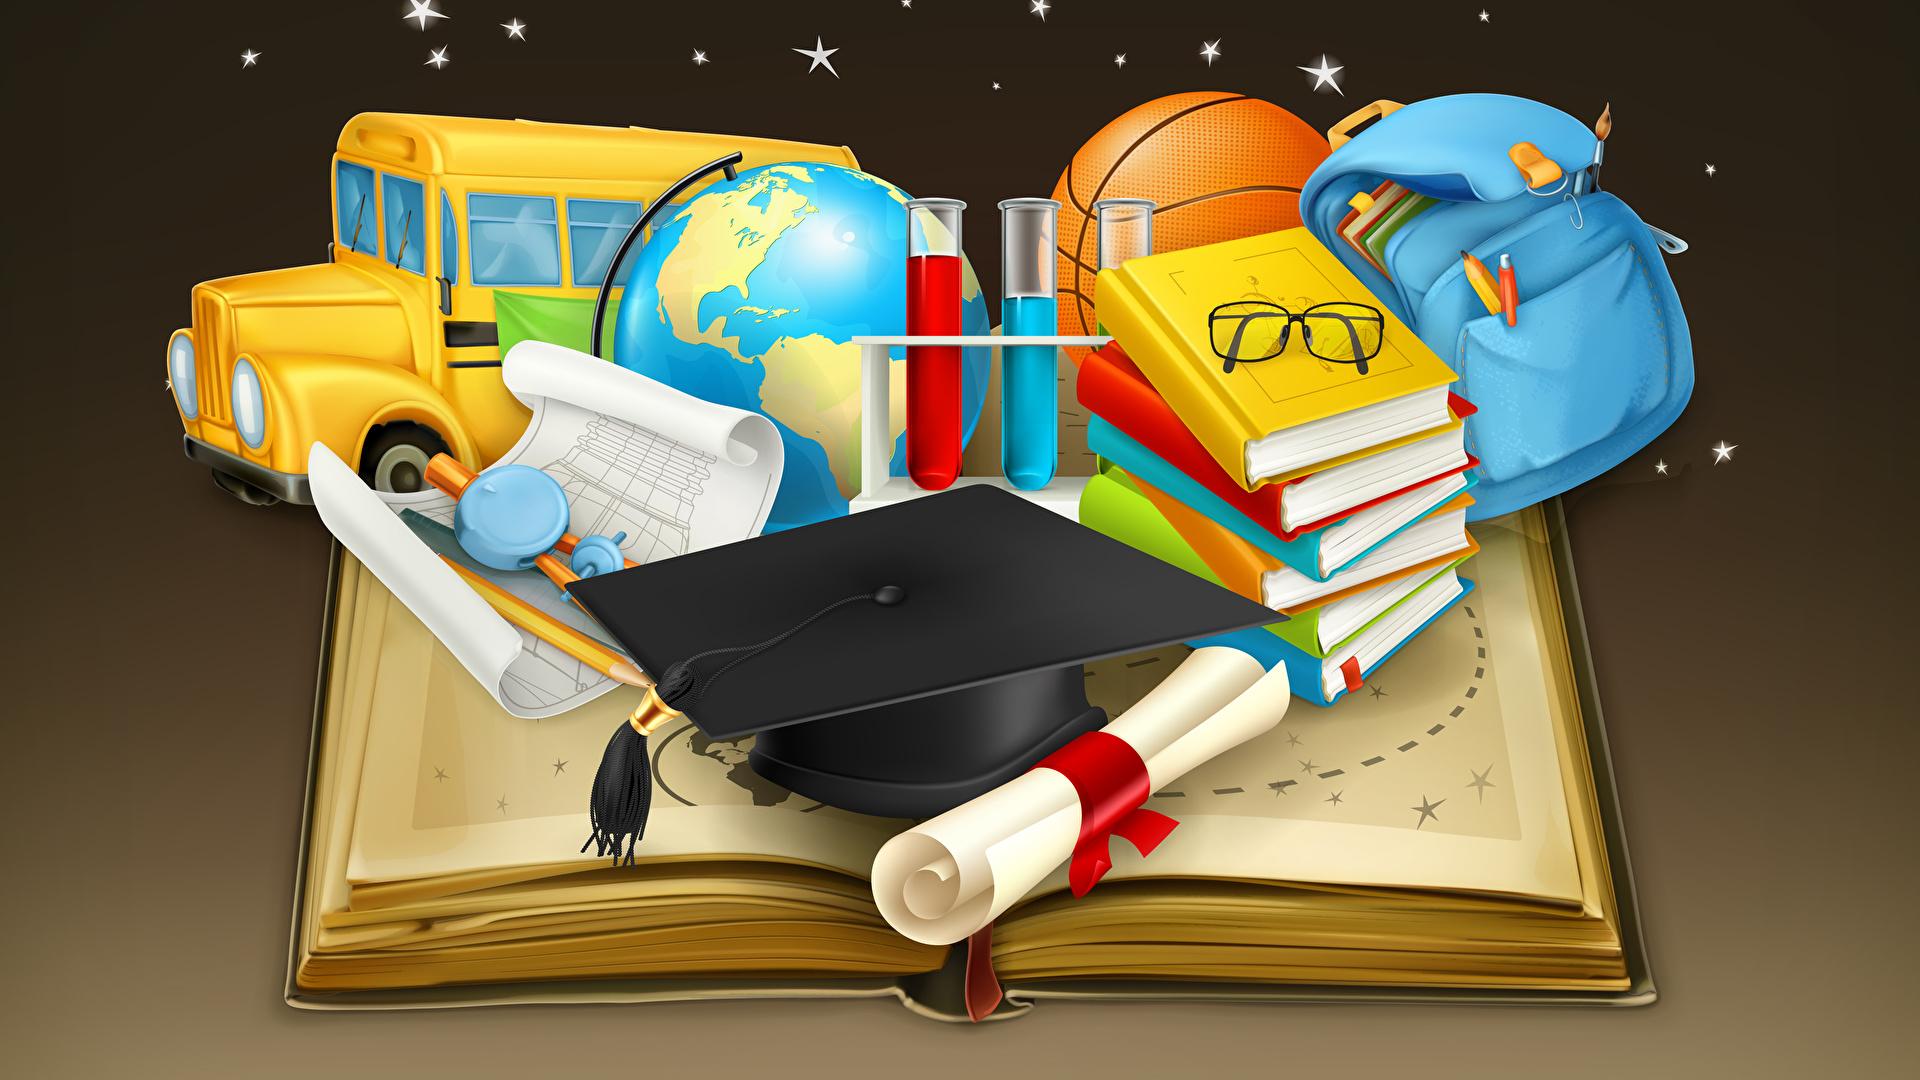 Education computer wallpaper